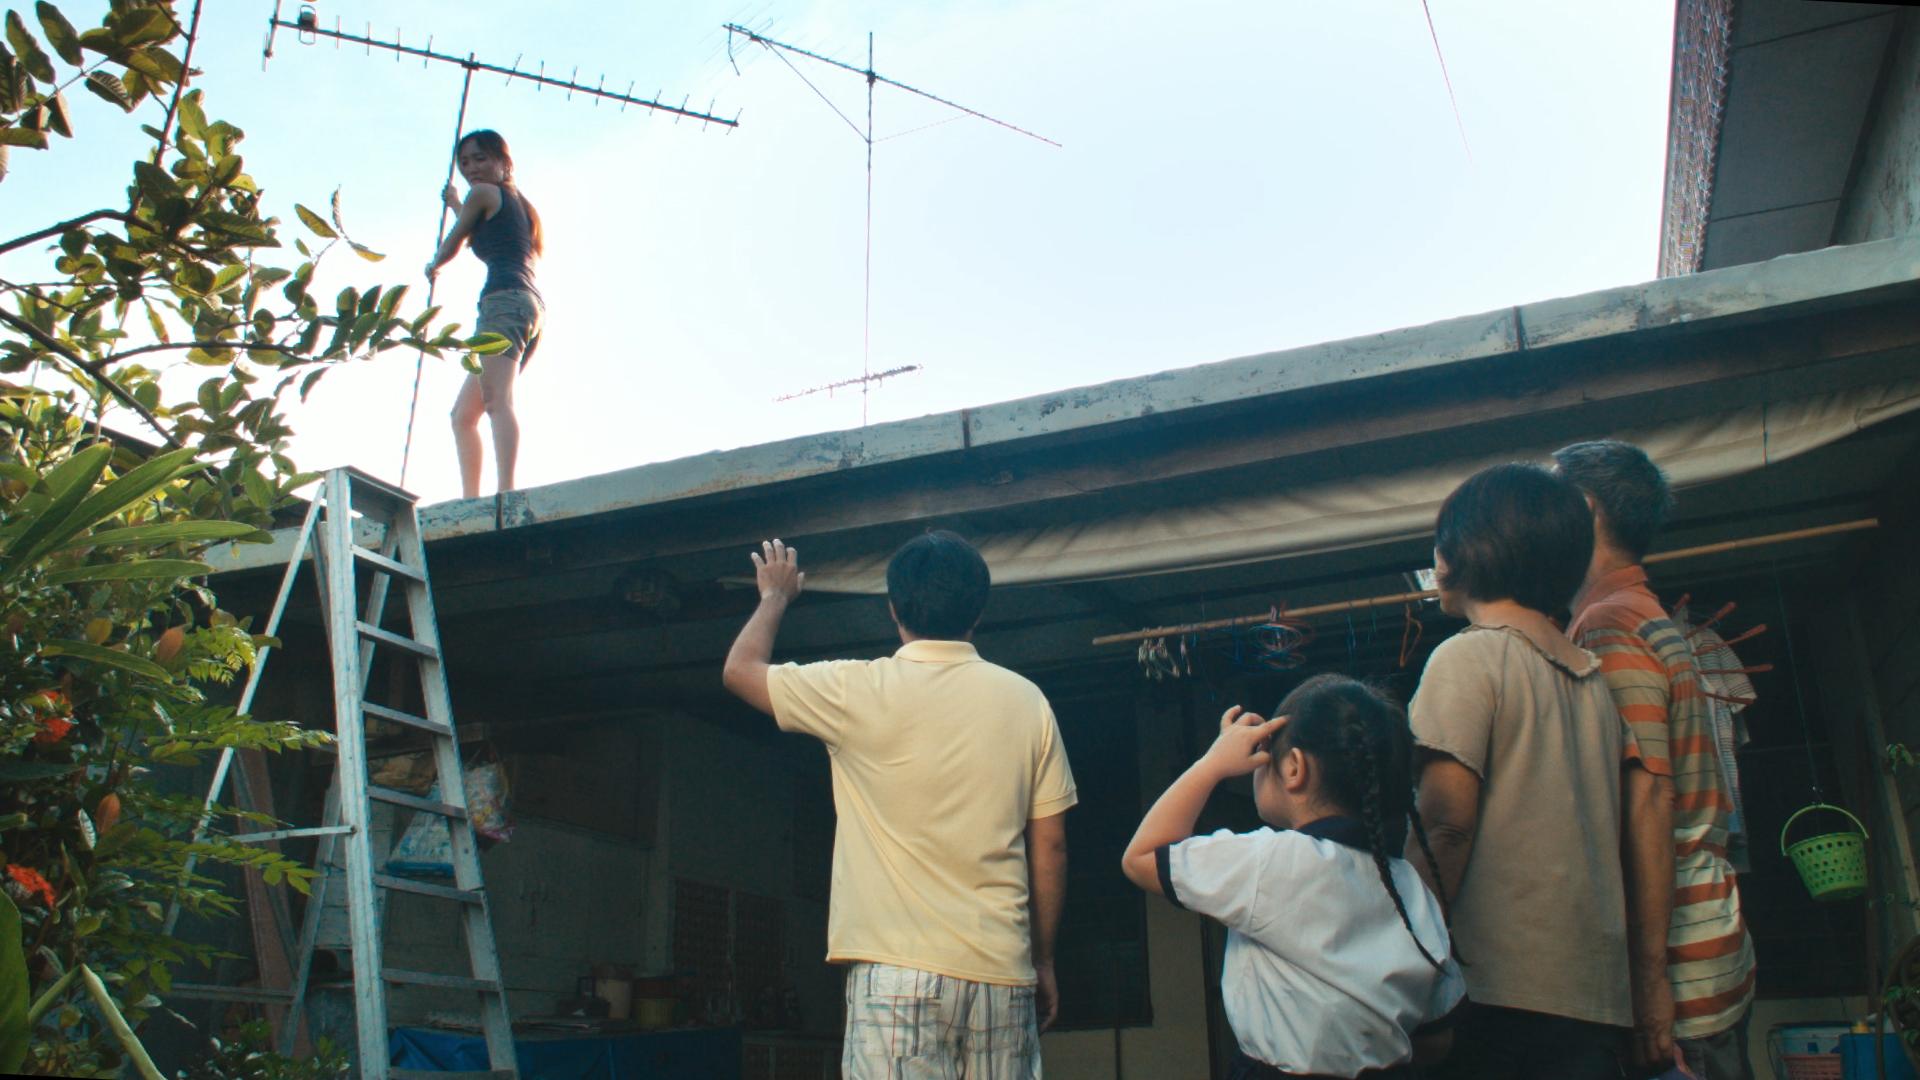 https://mdfilmfest.com/wp-content/uploads/Kampung-Tapir.jpg